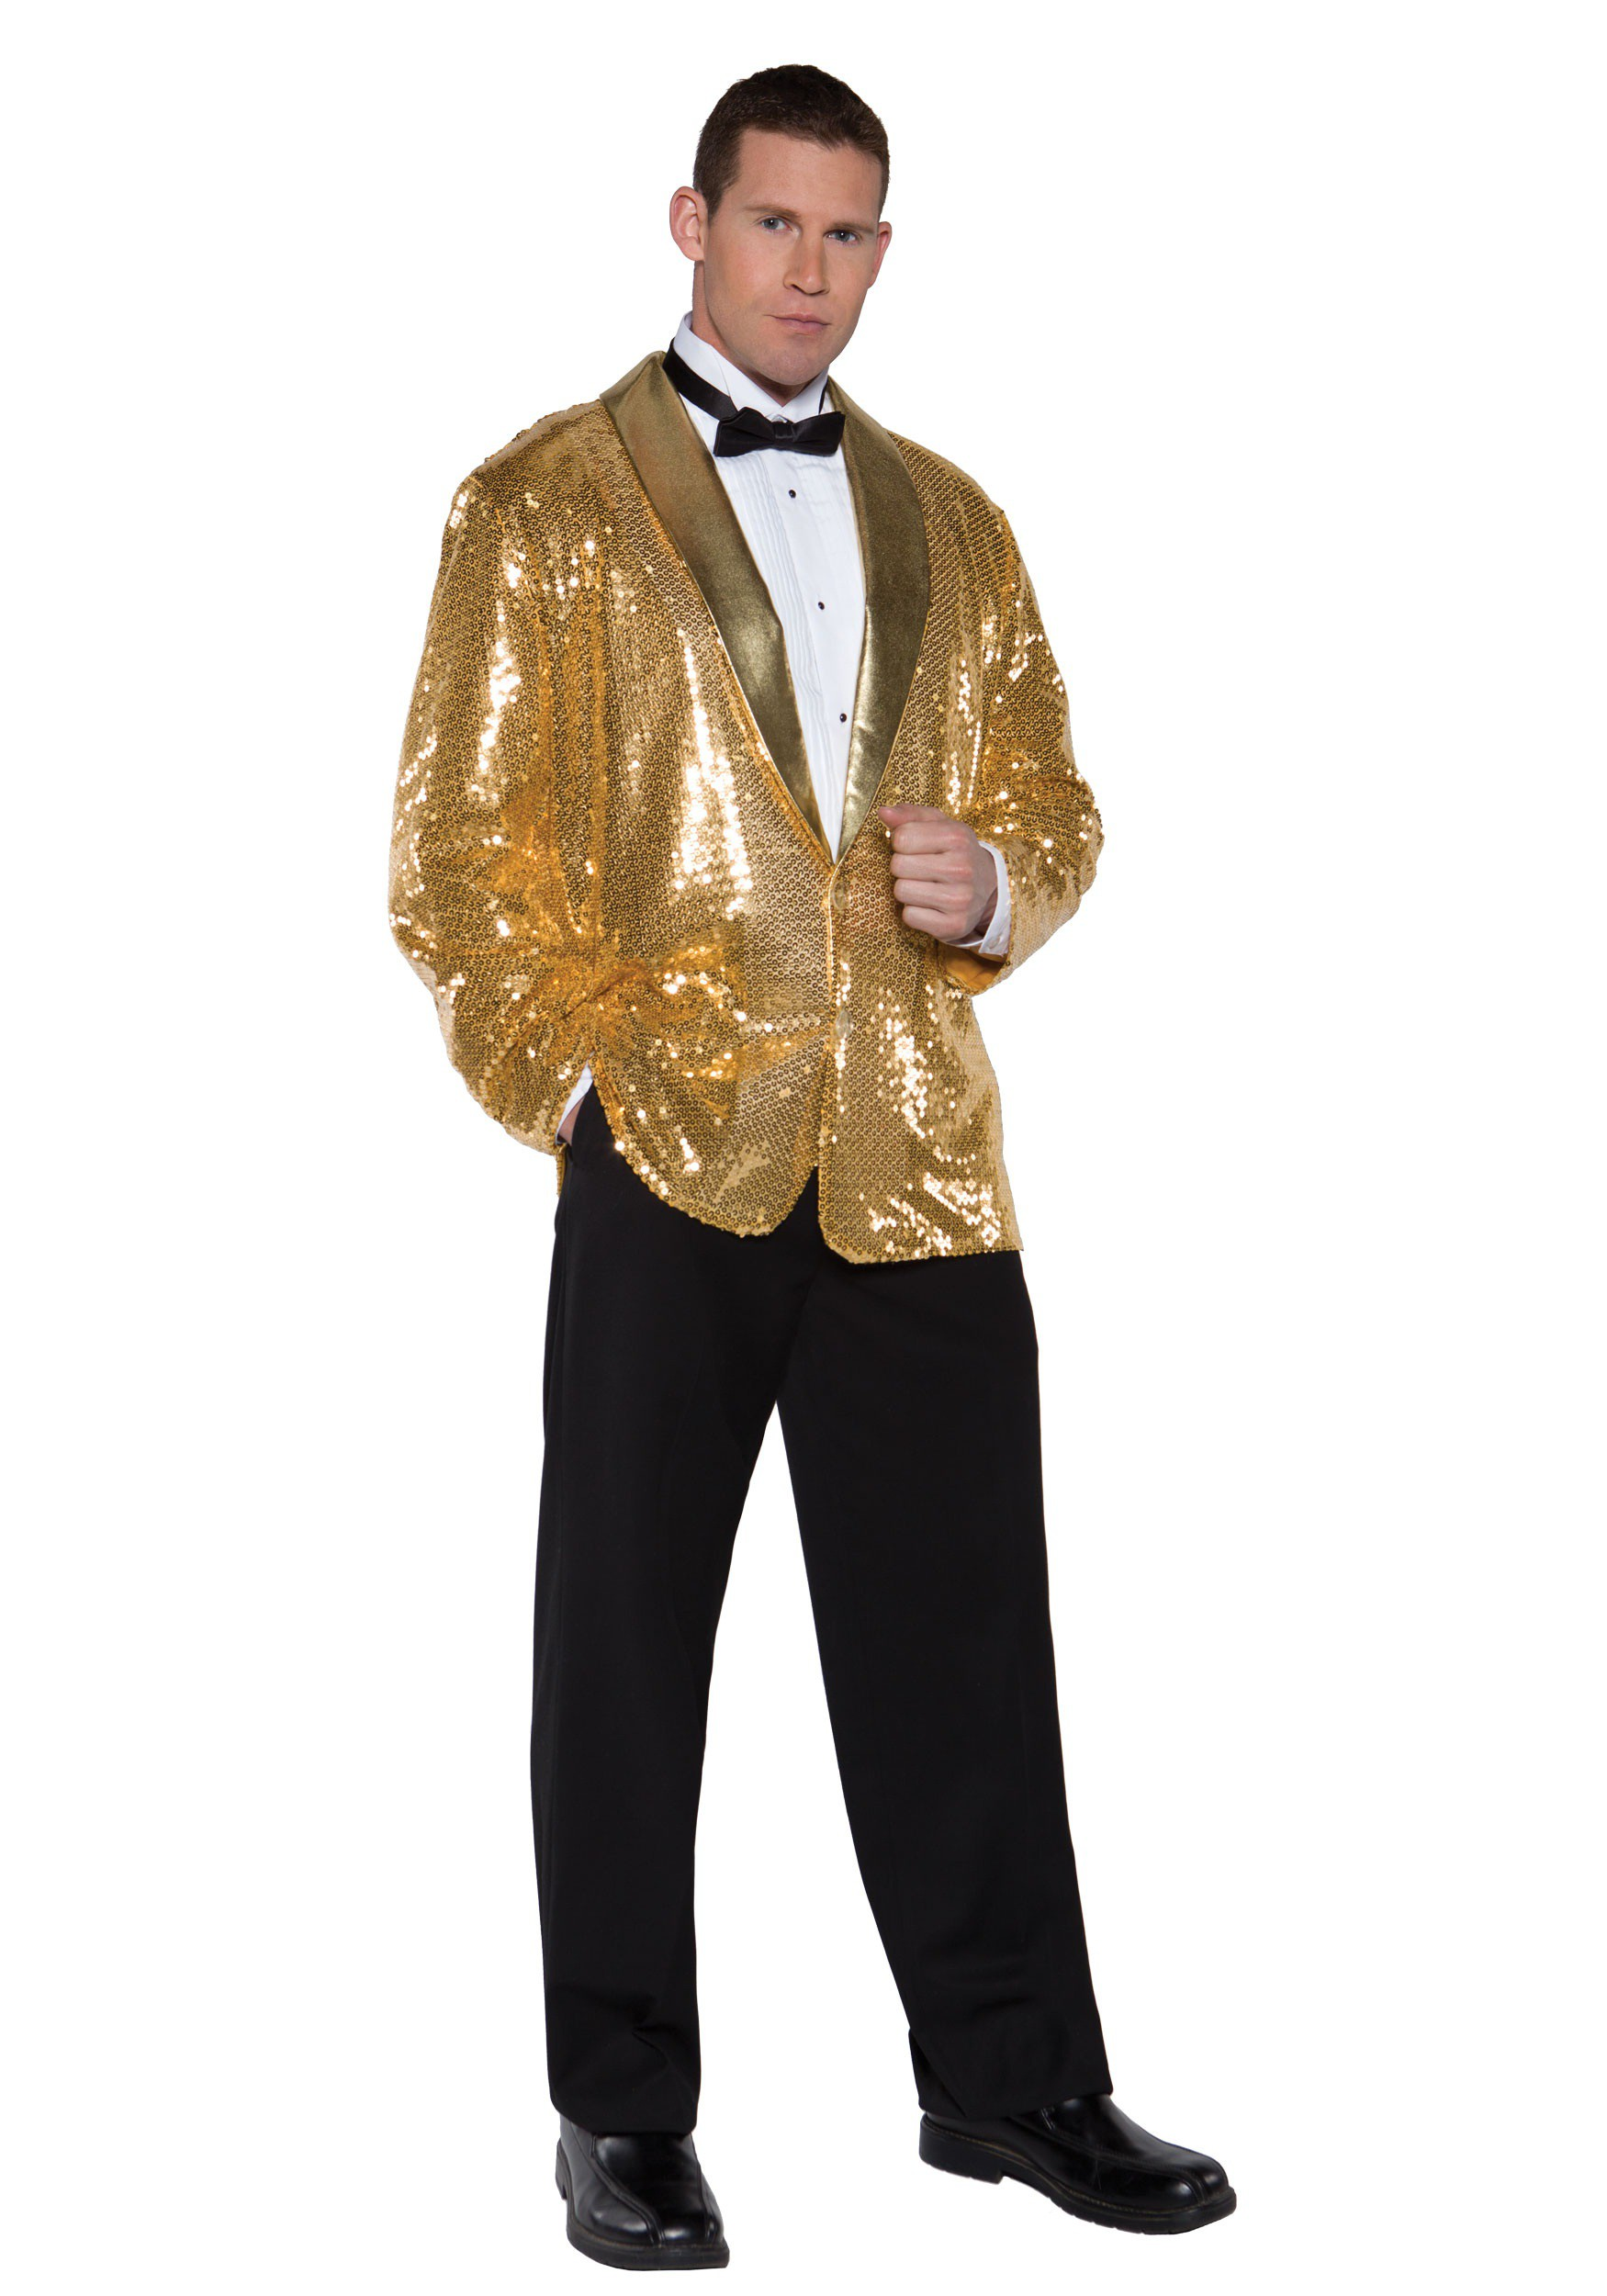 Costume Gold Sequin Jacket